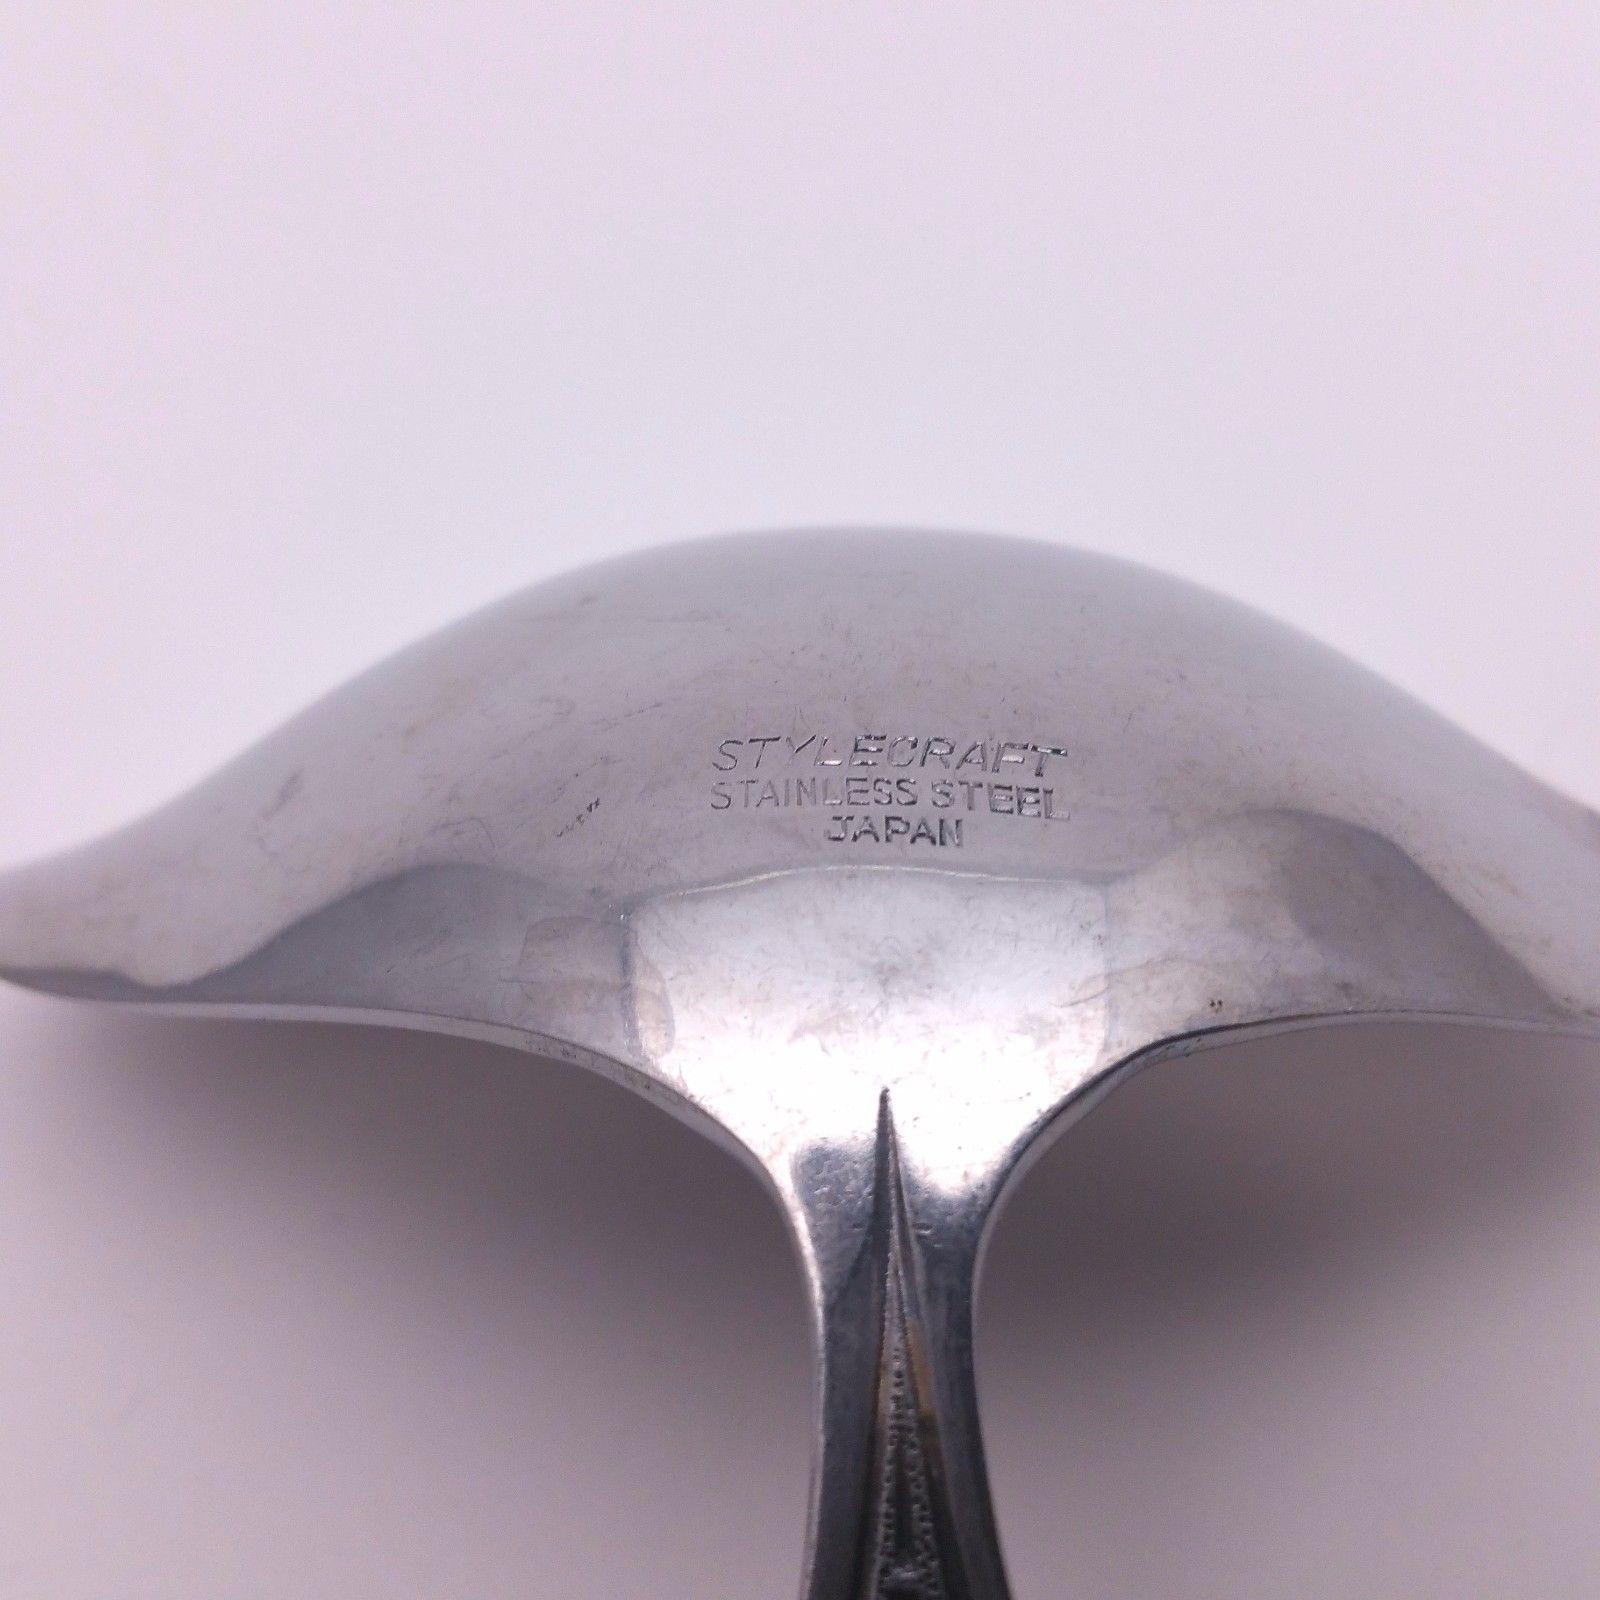 Stylecraft SYF10 Stainless Steel Gravy Ladle